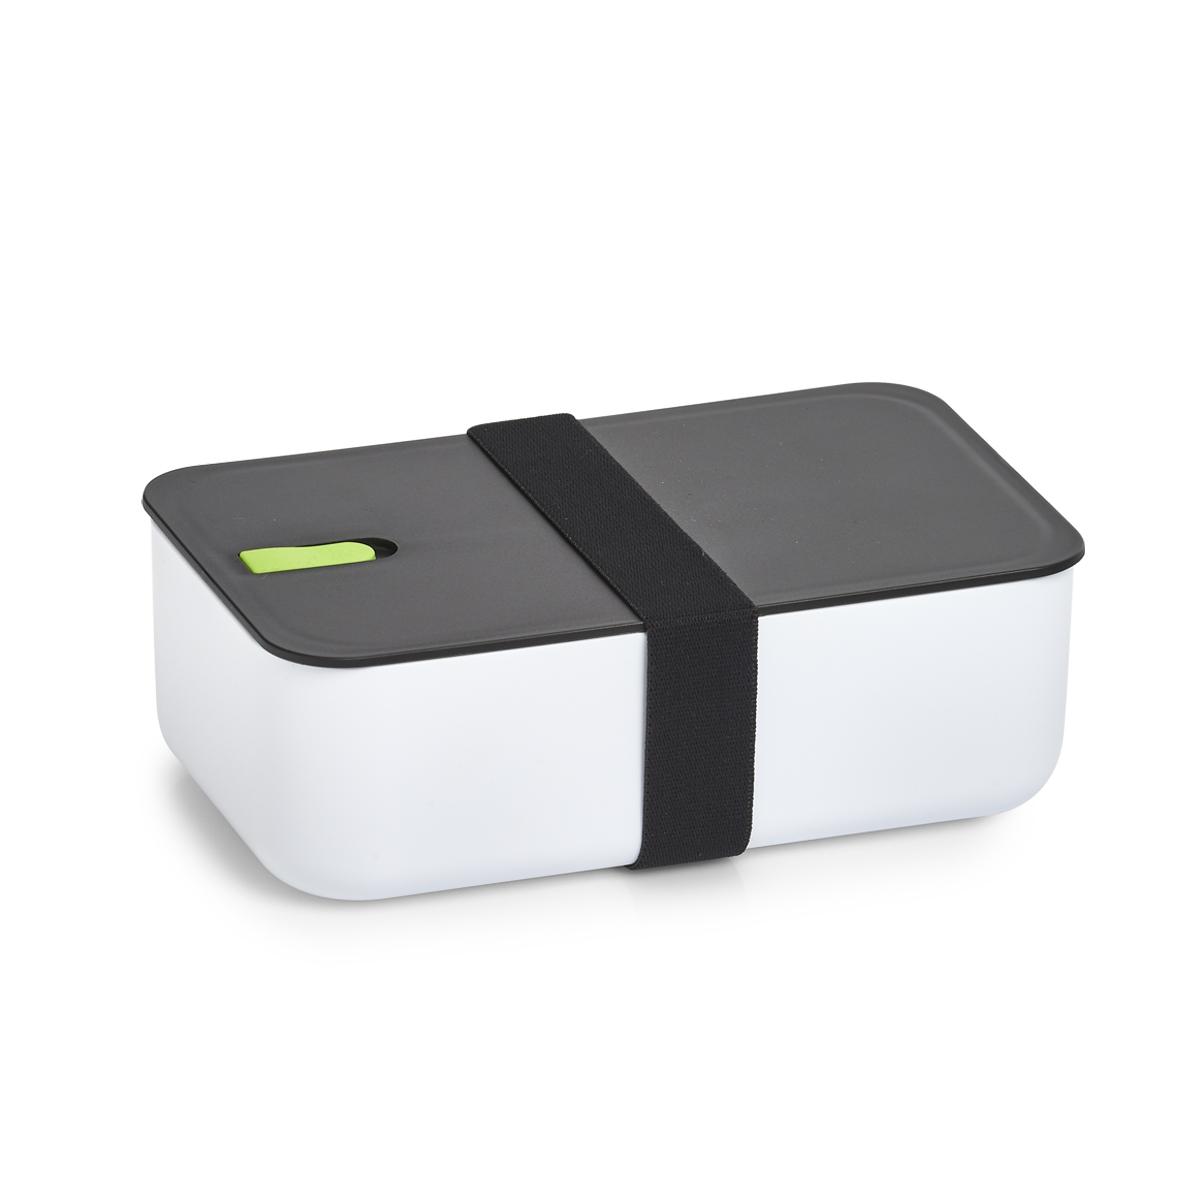 Cutie pentru depozitare Black&White Verde, L19xl12xH6,5 cm imagine